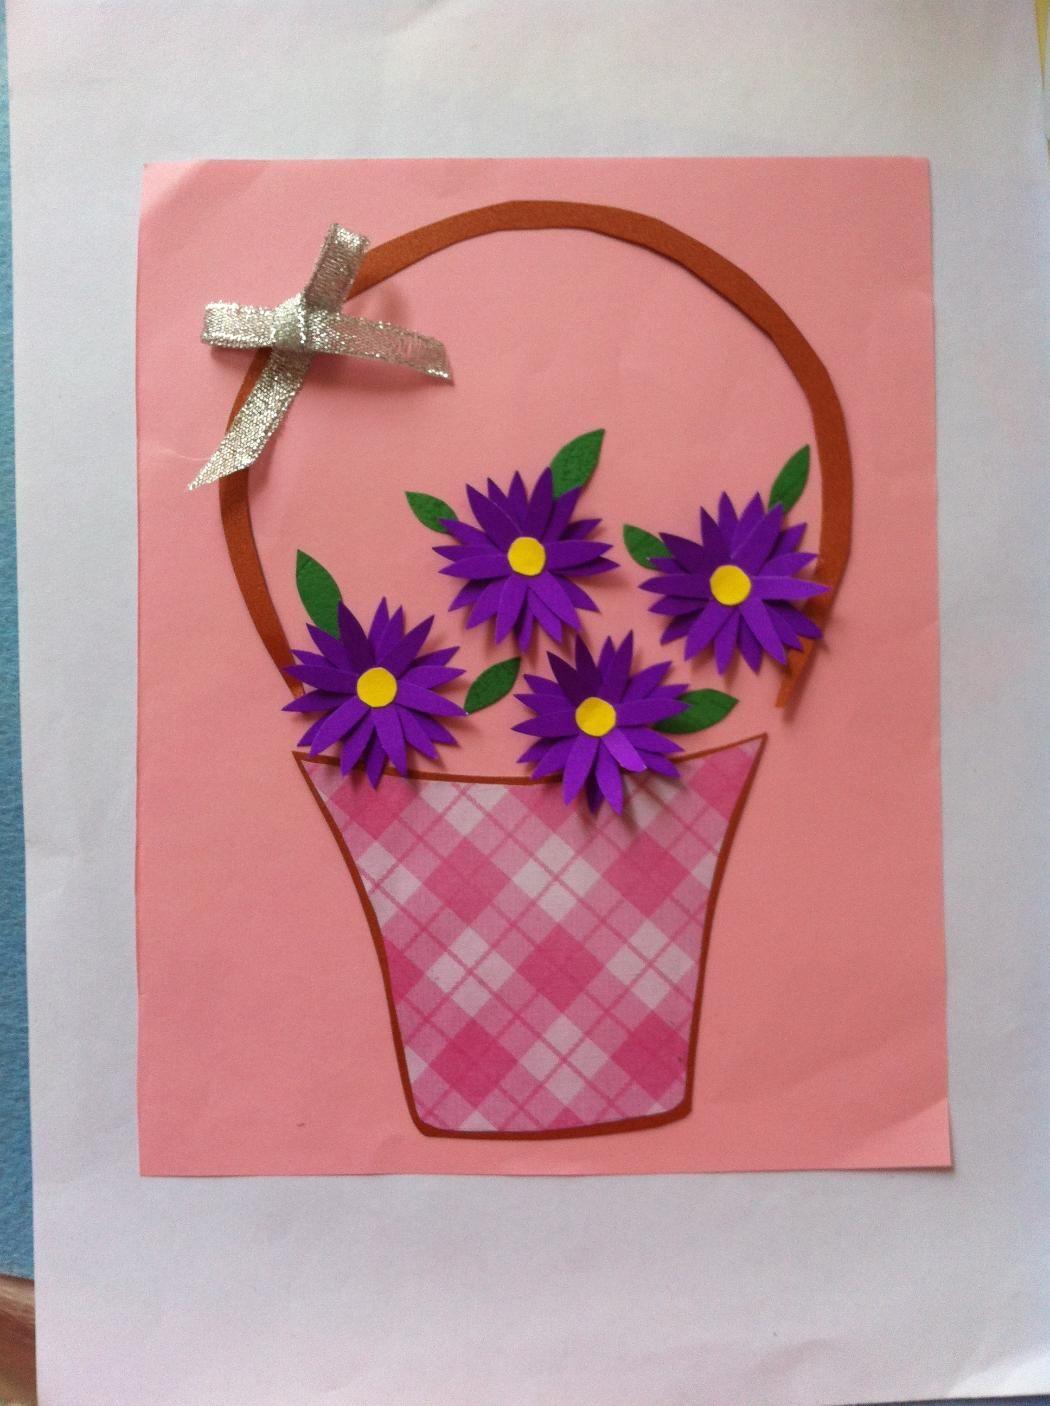 Diy motherus day flower artwork gift flower artwork artwork and